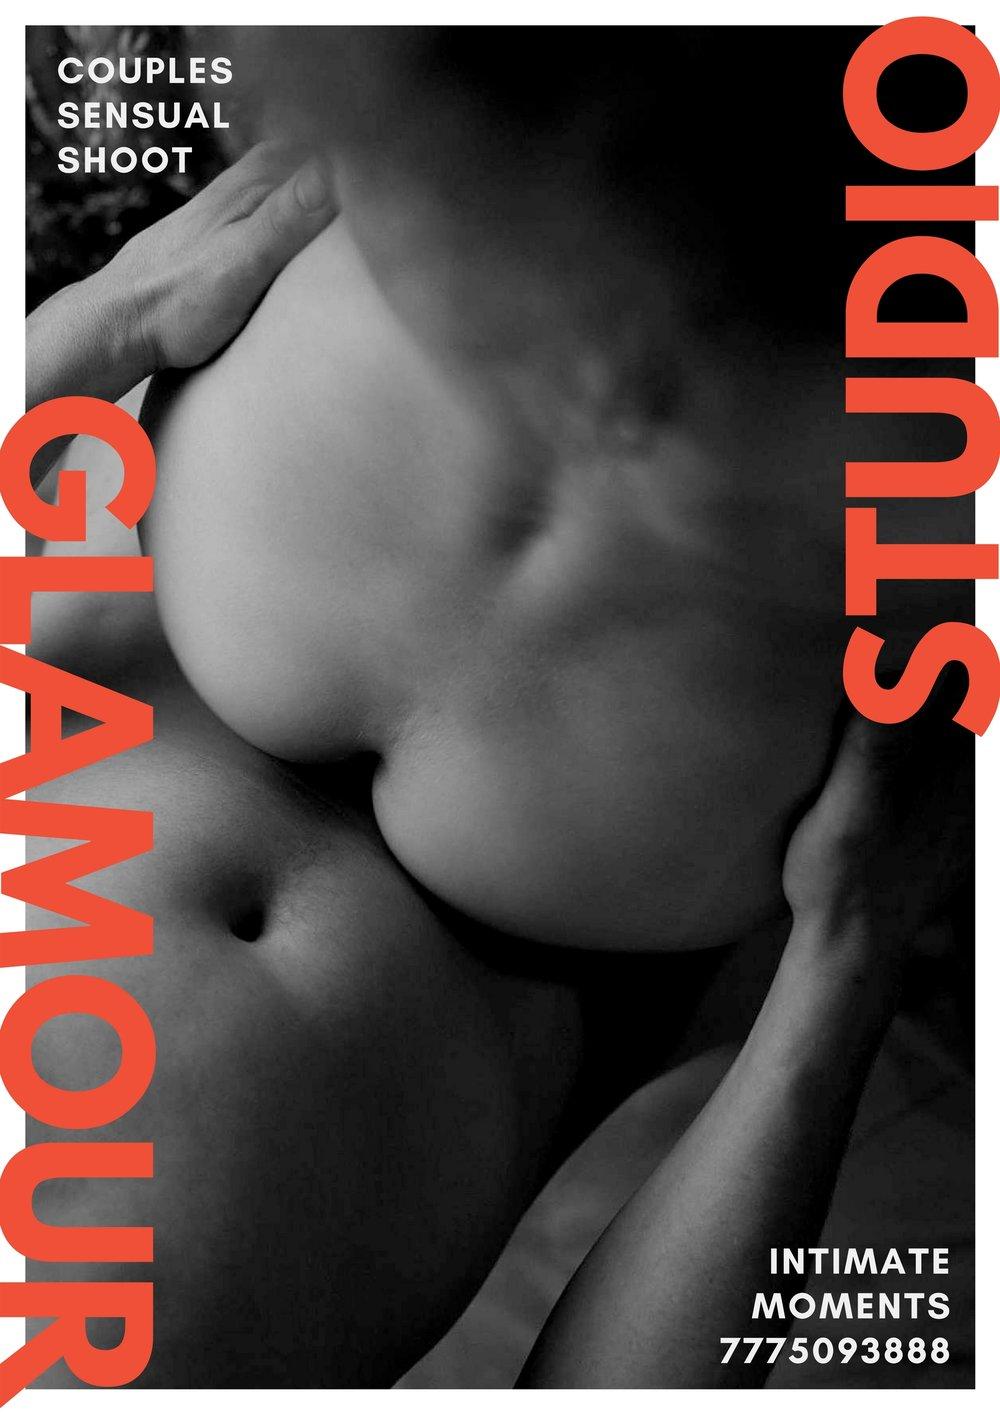 19juliawinterstudiolondon2018studioglamour couples boudoir photoshoot london.jpg